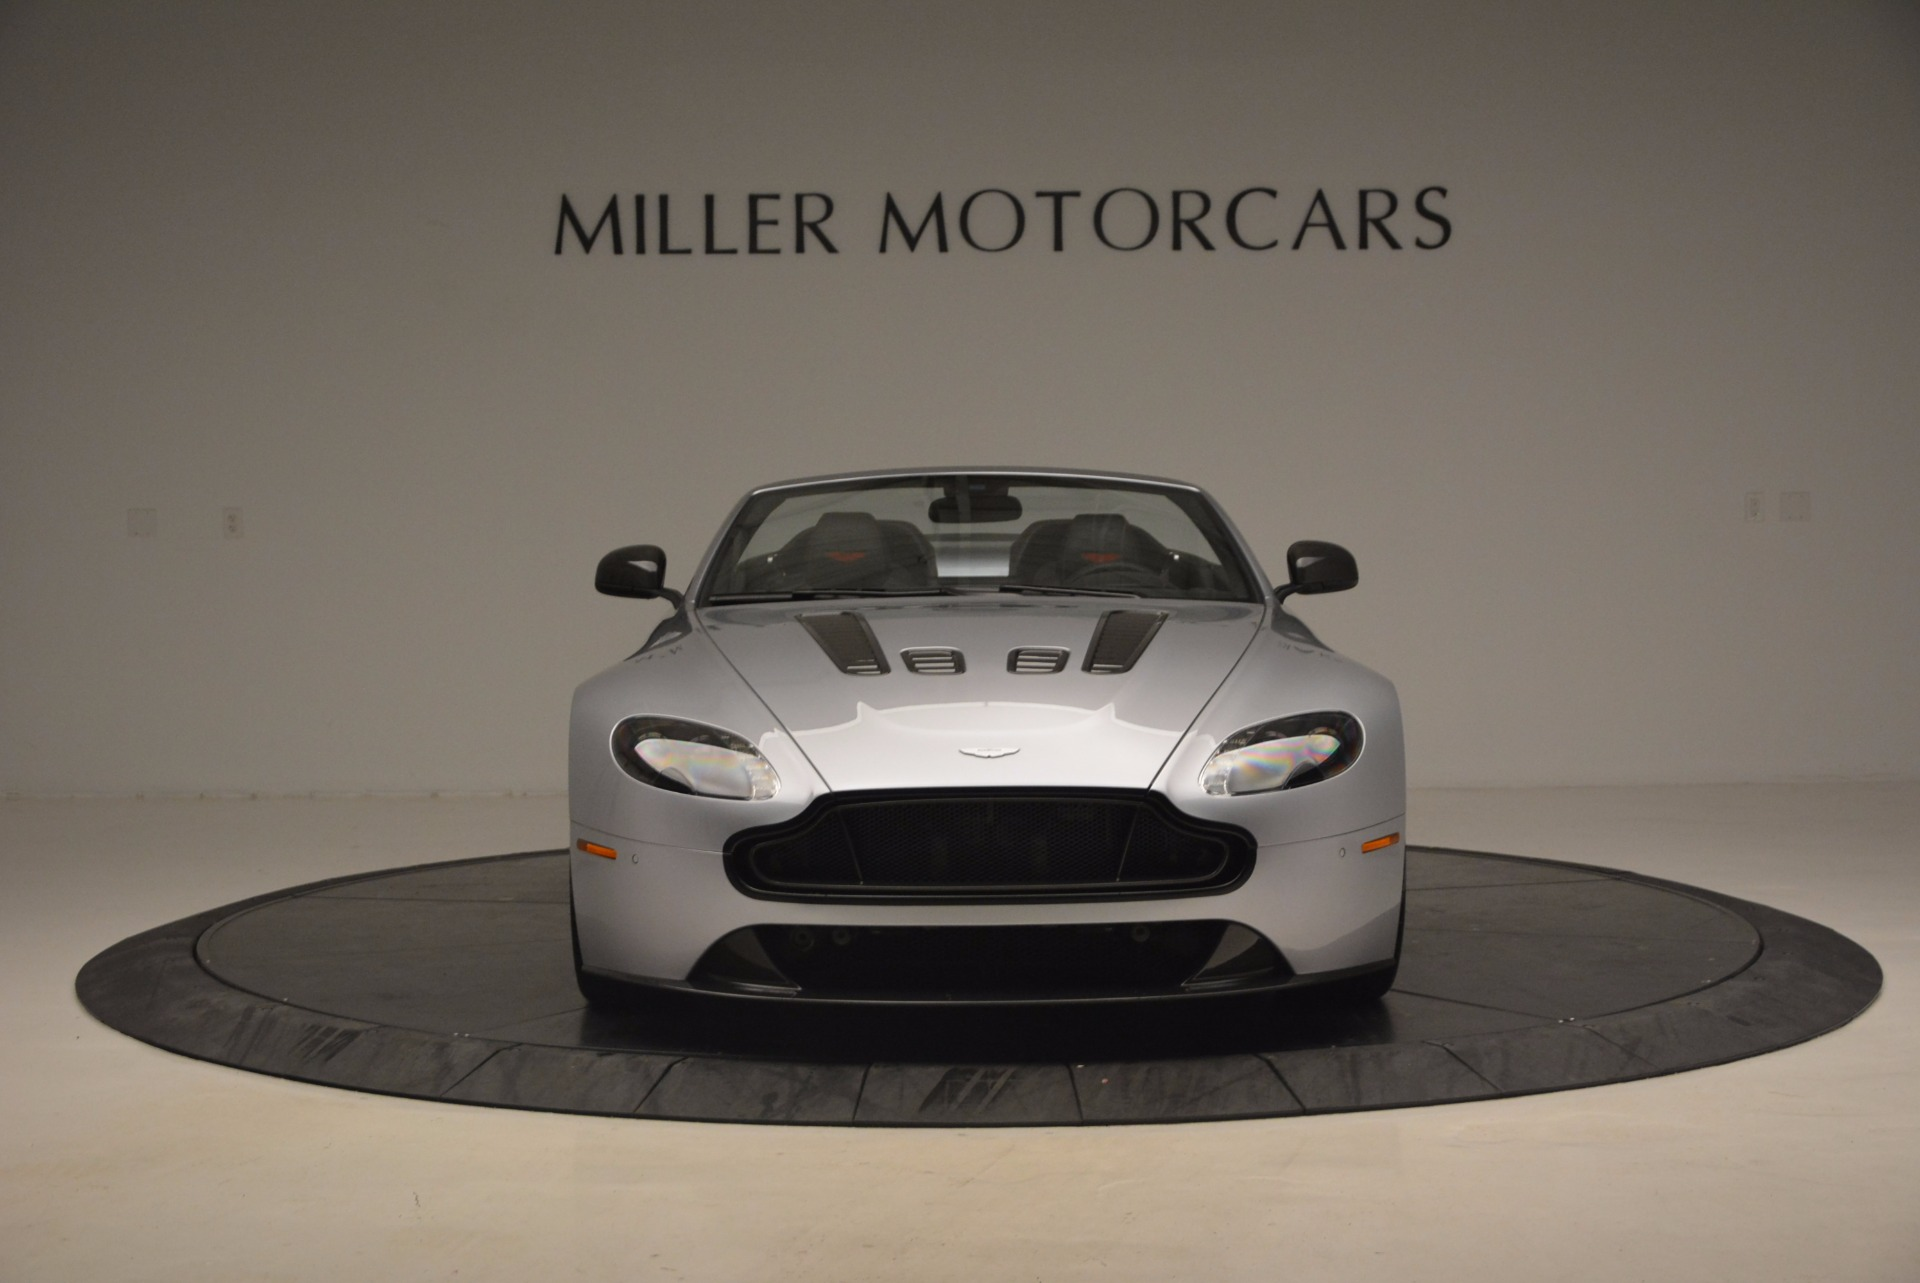 Used 2015 Aston Martin V12 Vantage S Roadster For Sale In Westport, CT 1130_p12